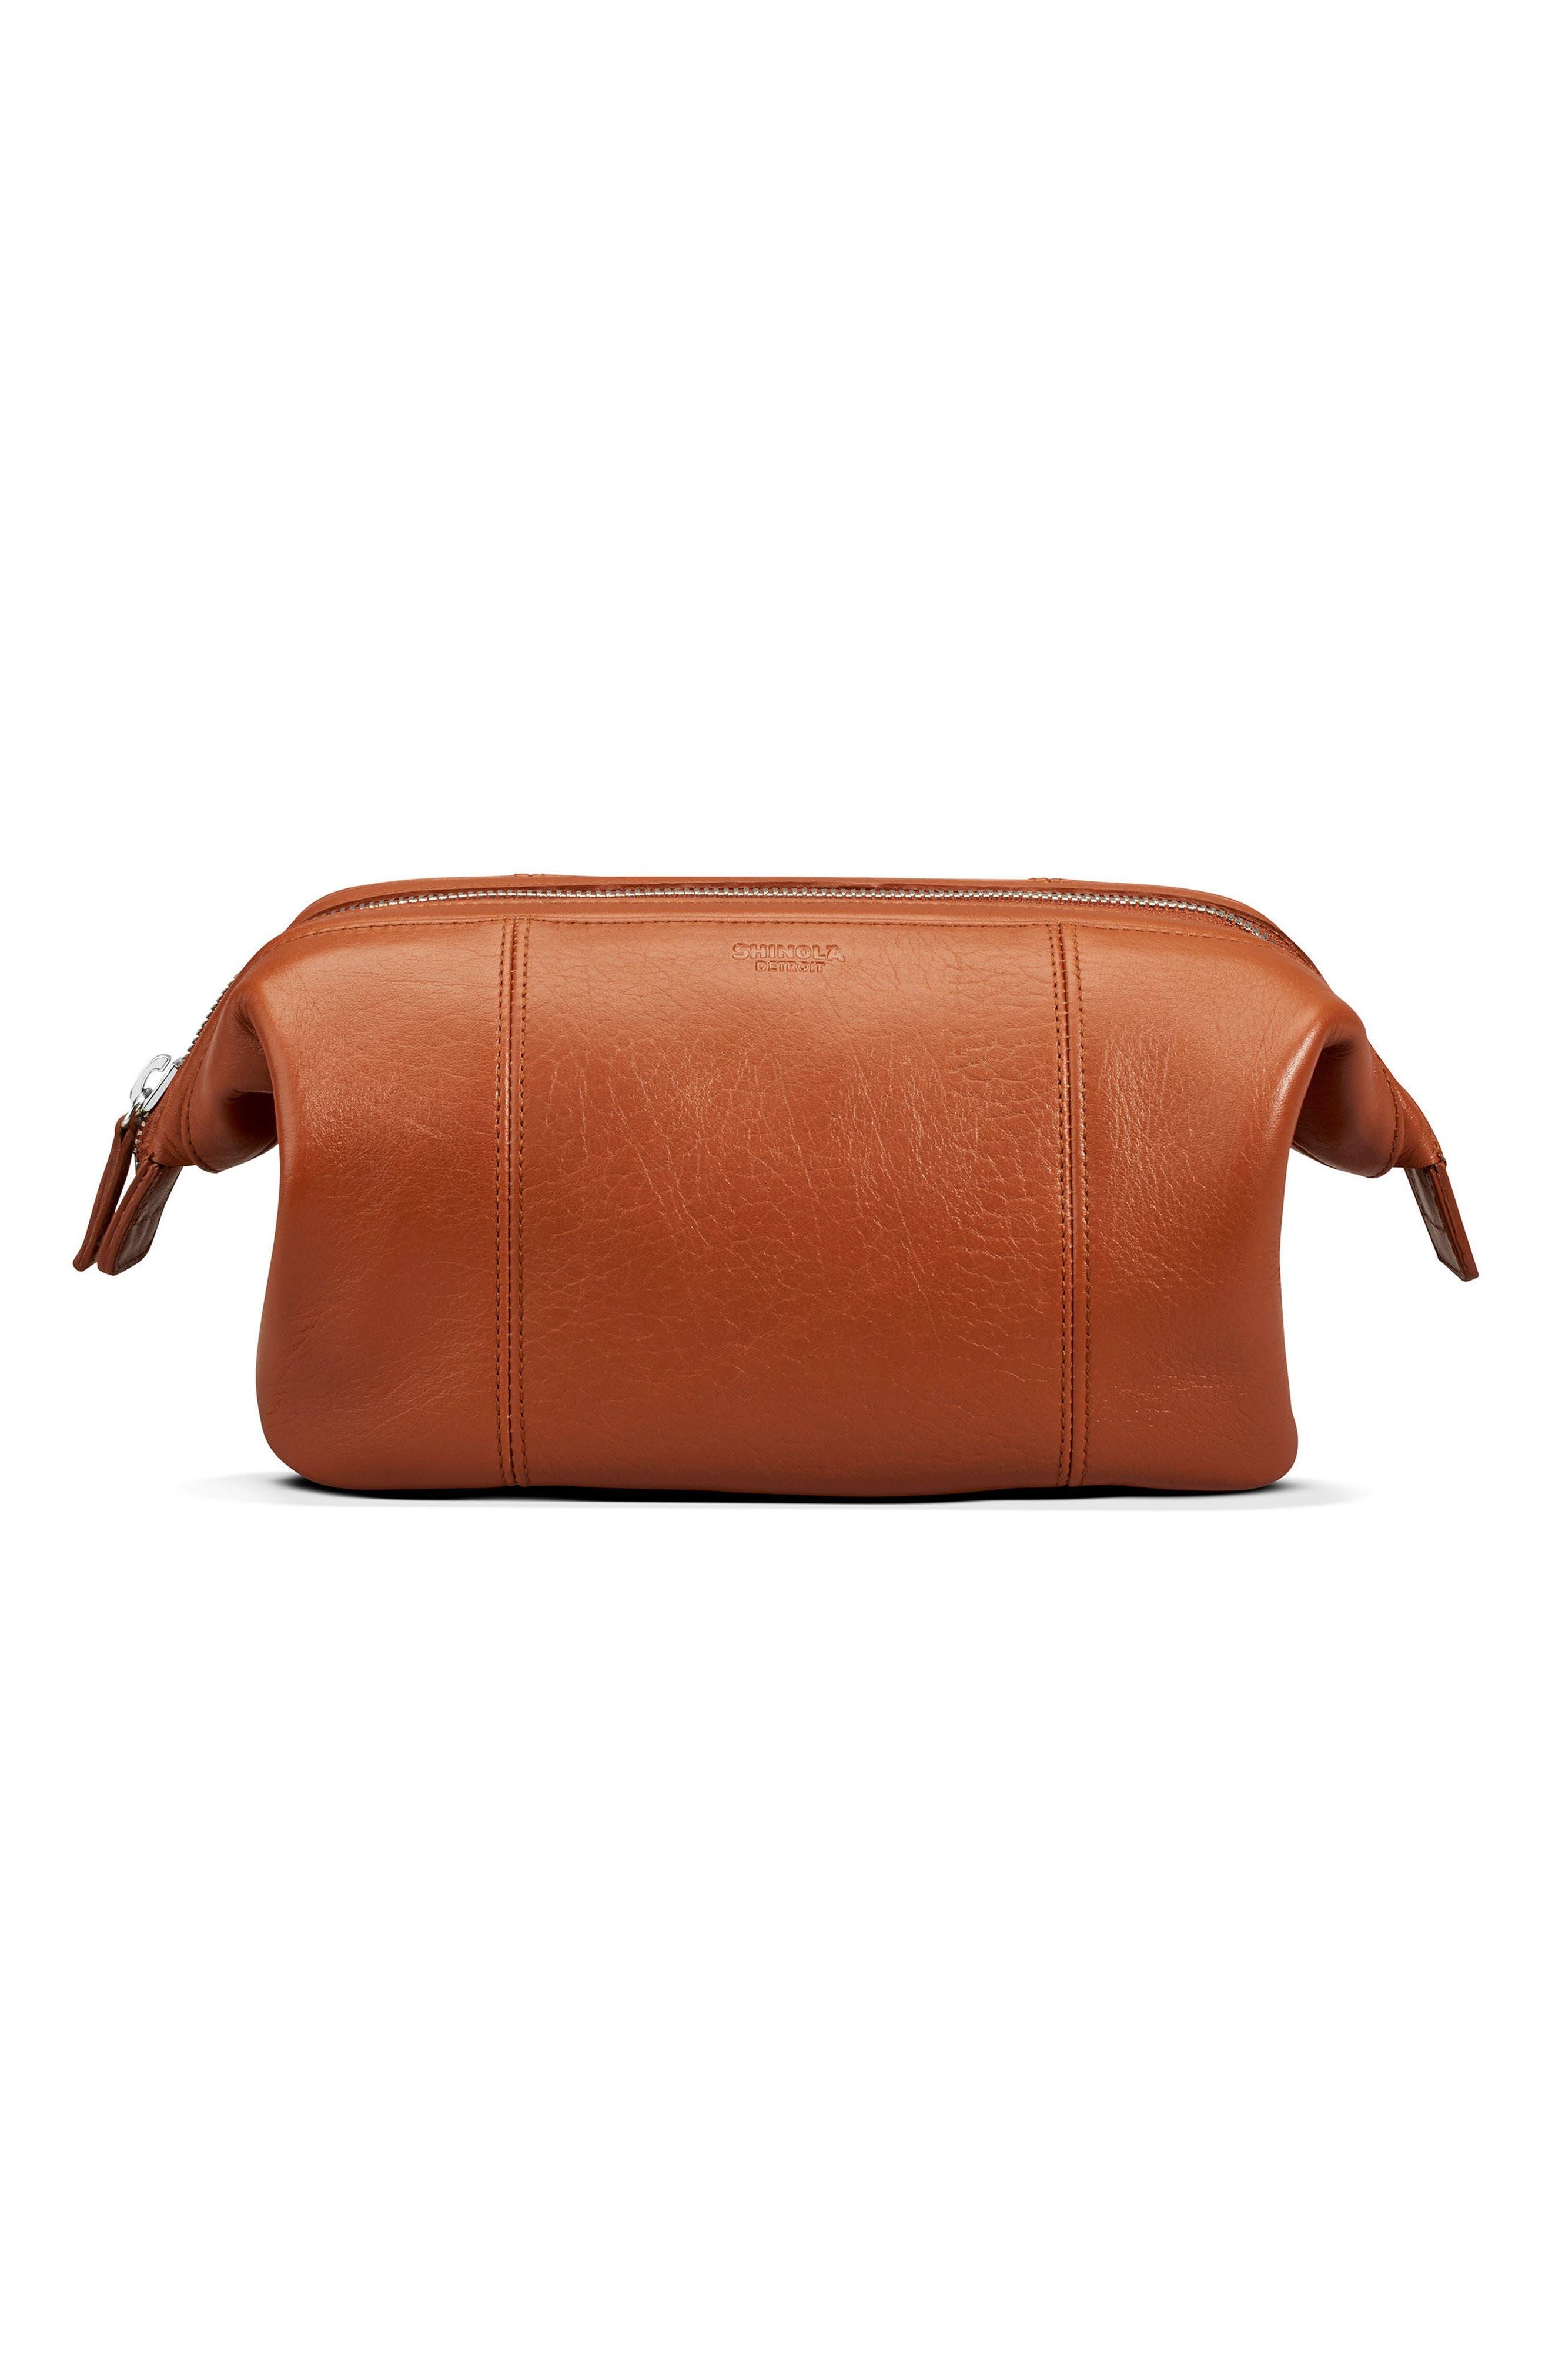 Leather Travel Kit,                         Main,                         color, Bourbon